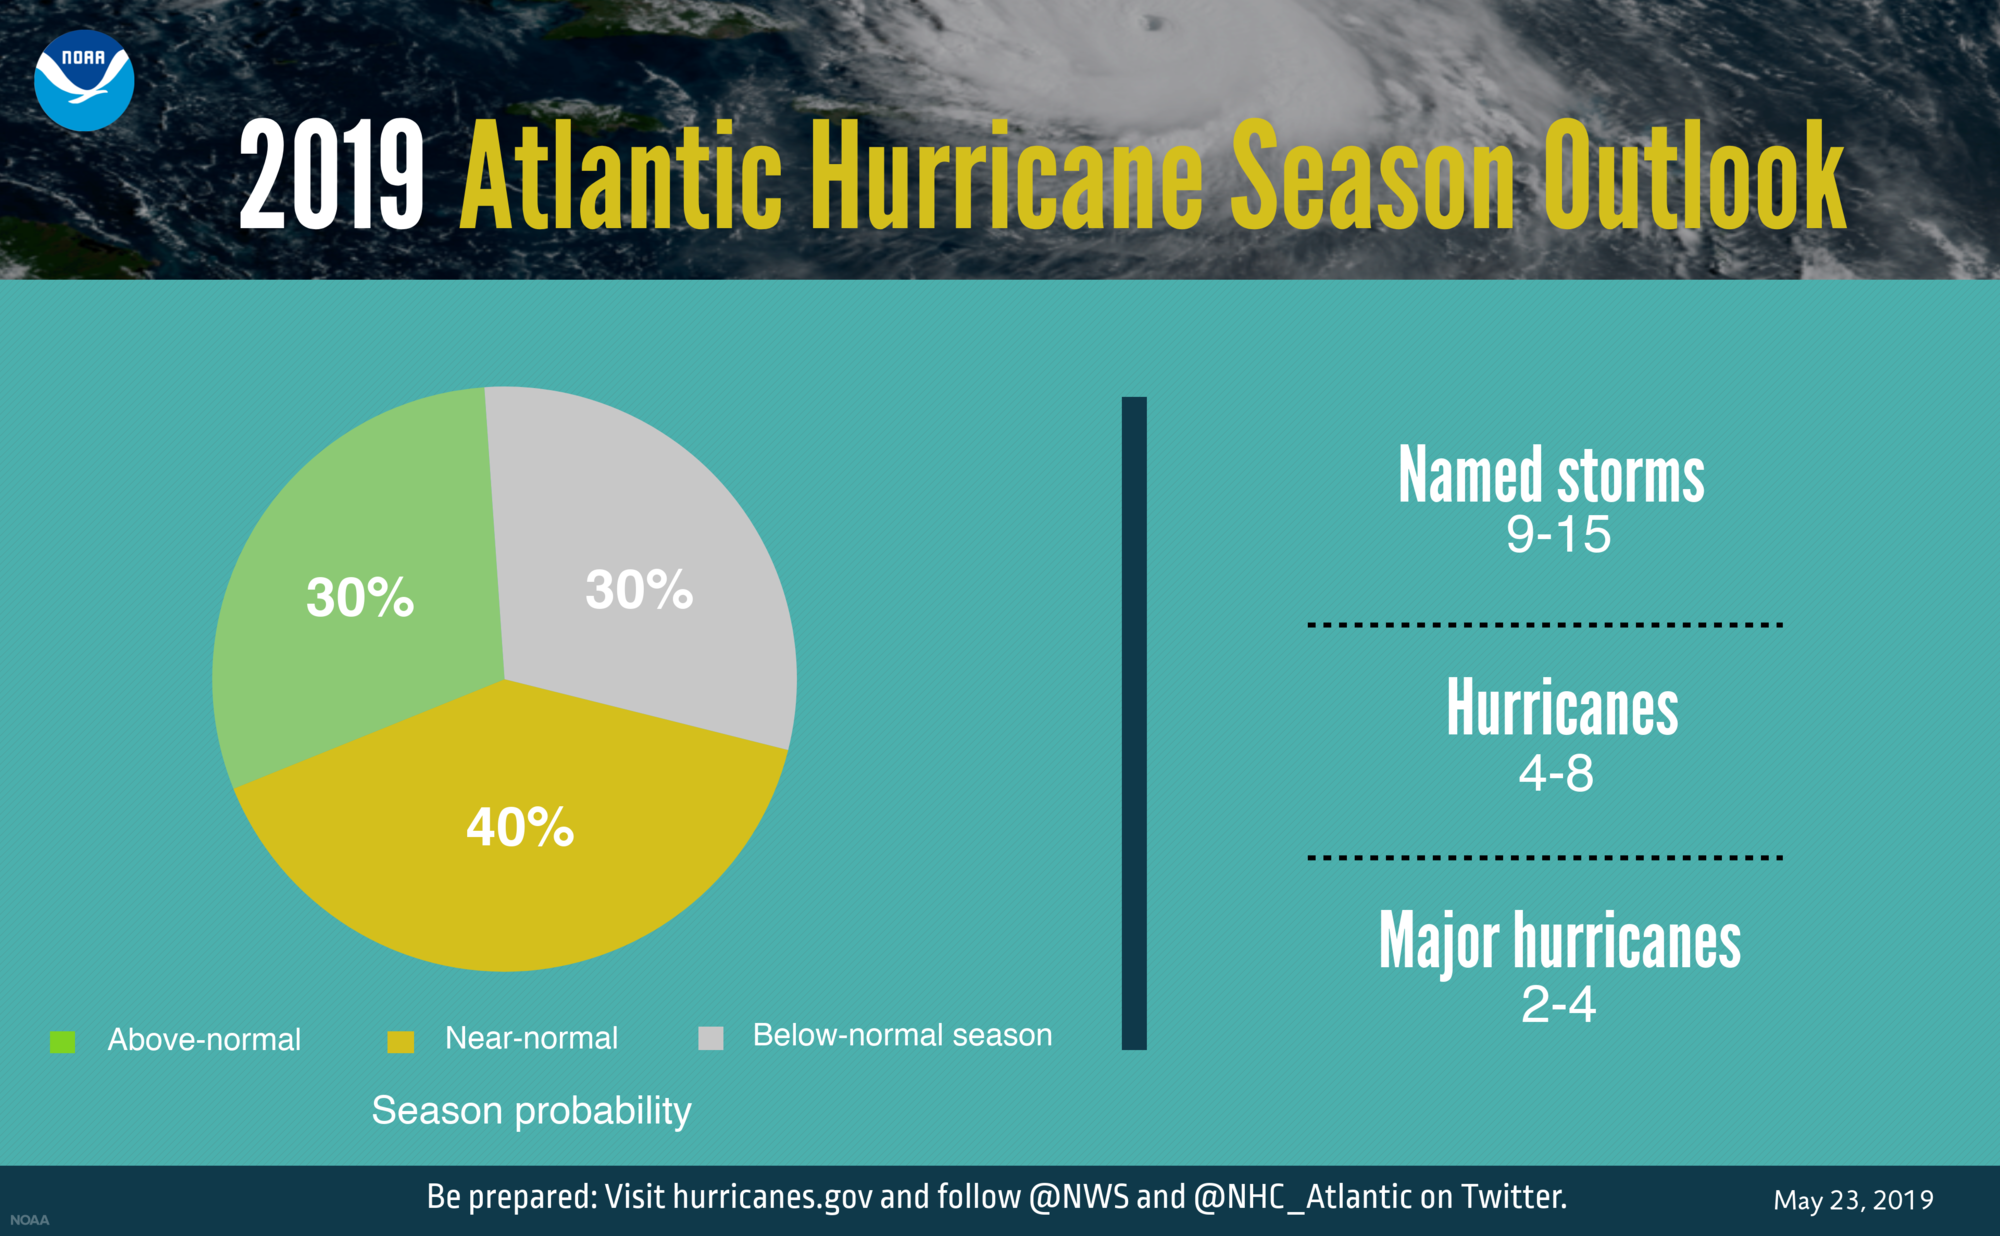 Coast Guard urges preparedness for 2019 hurricane season